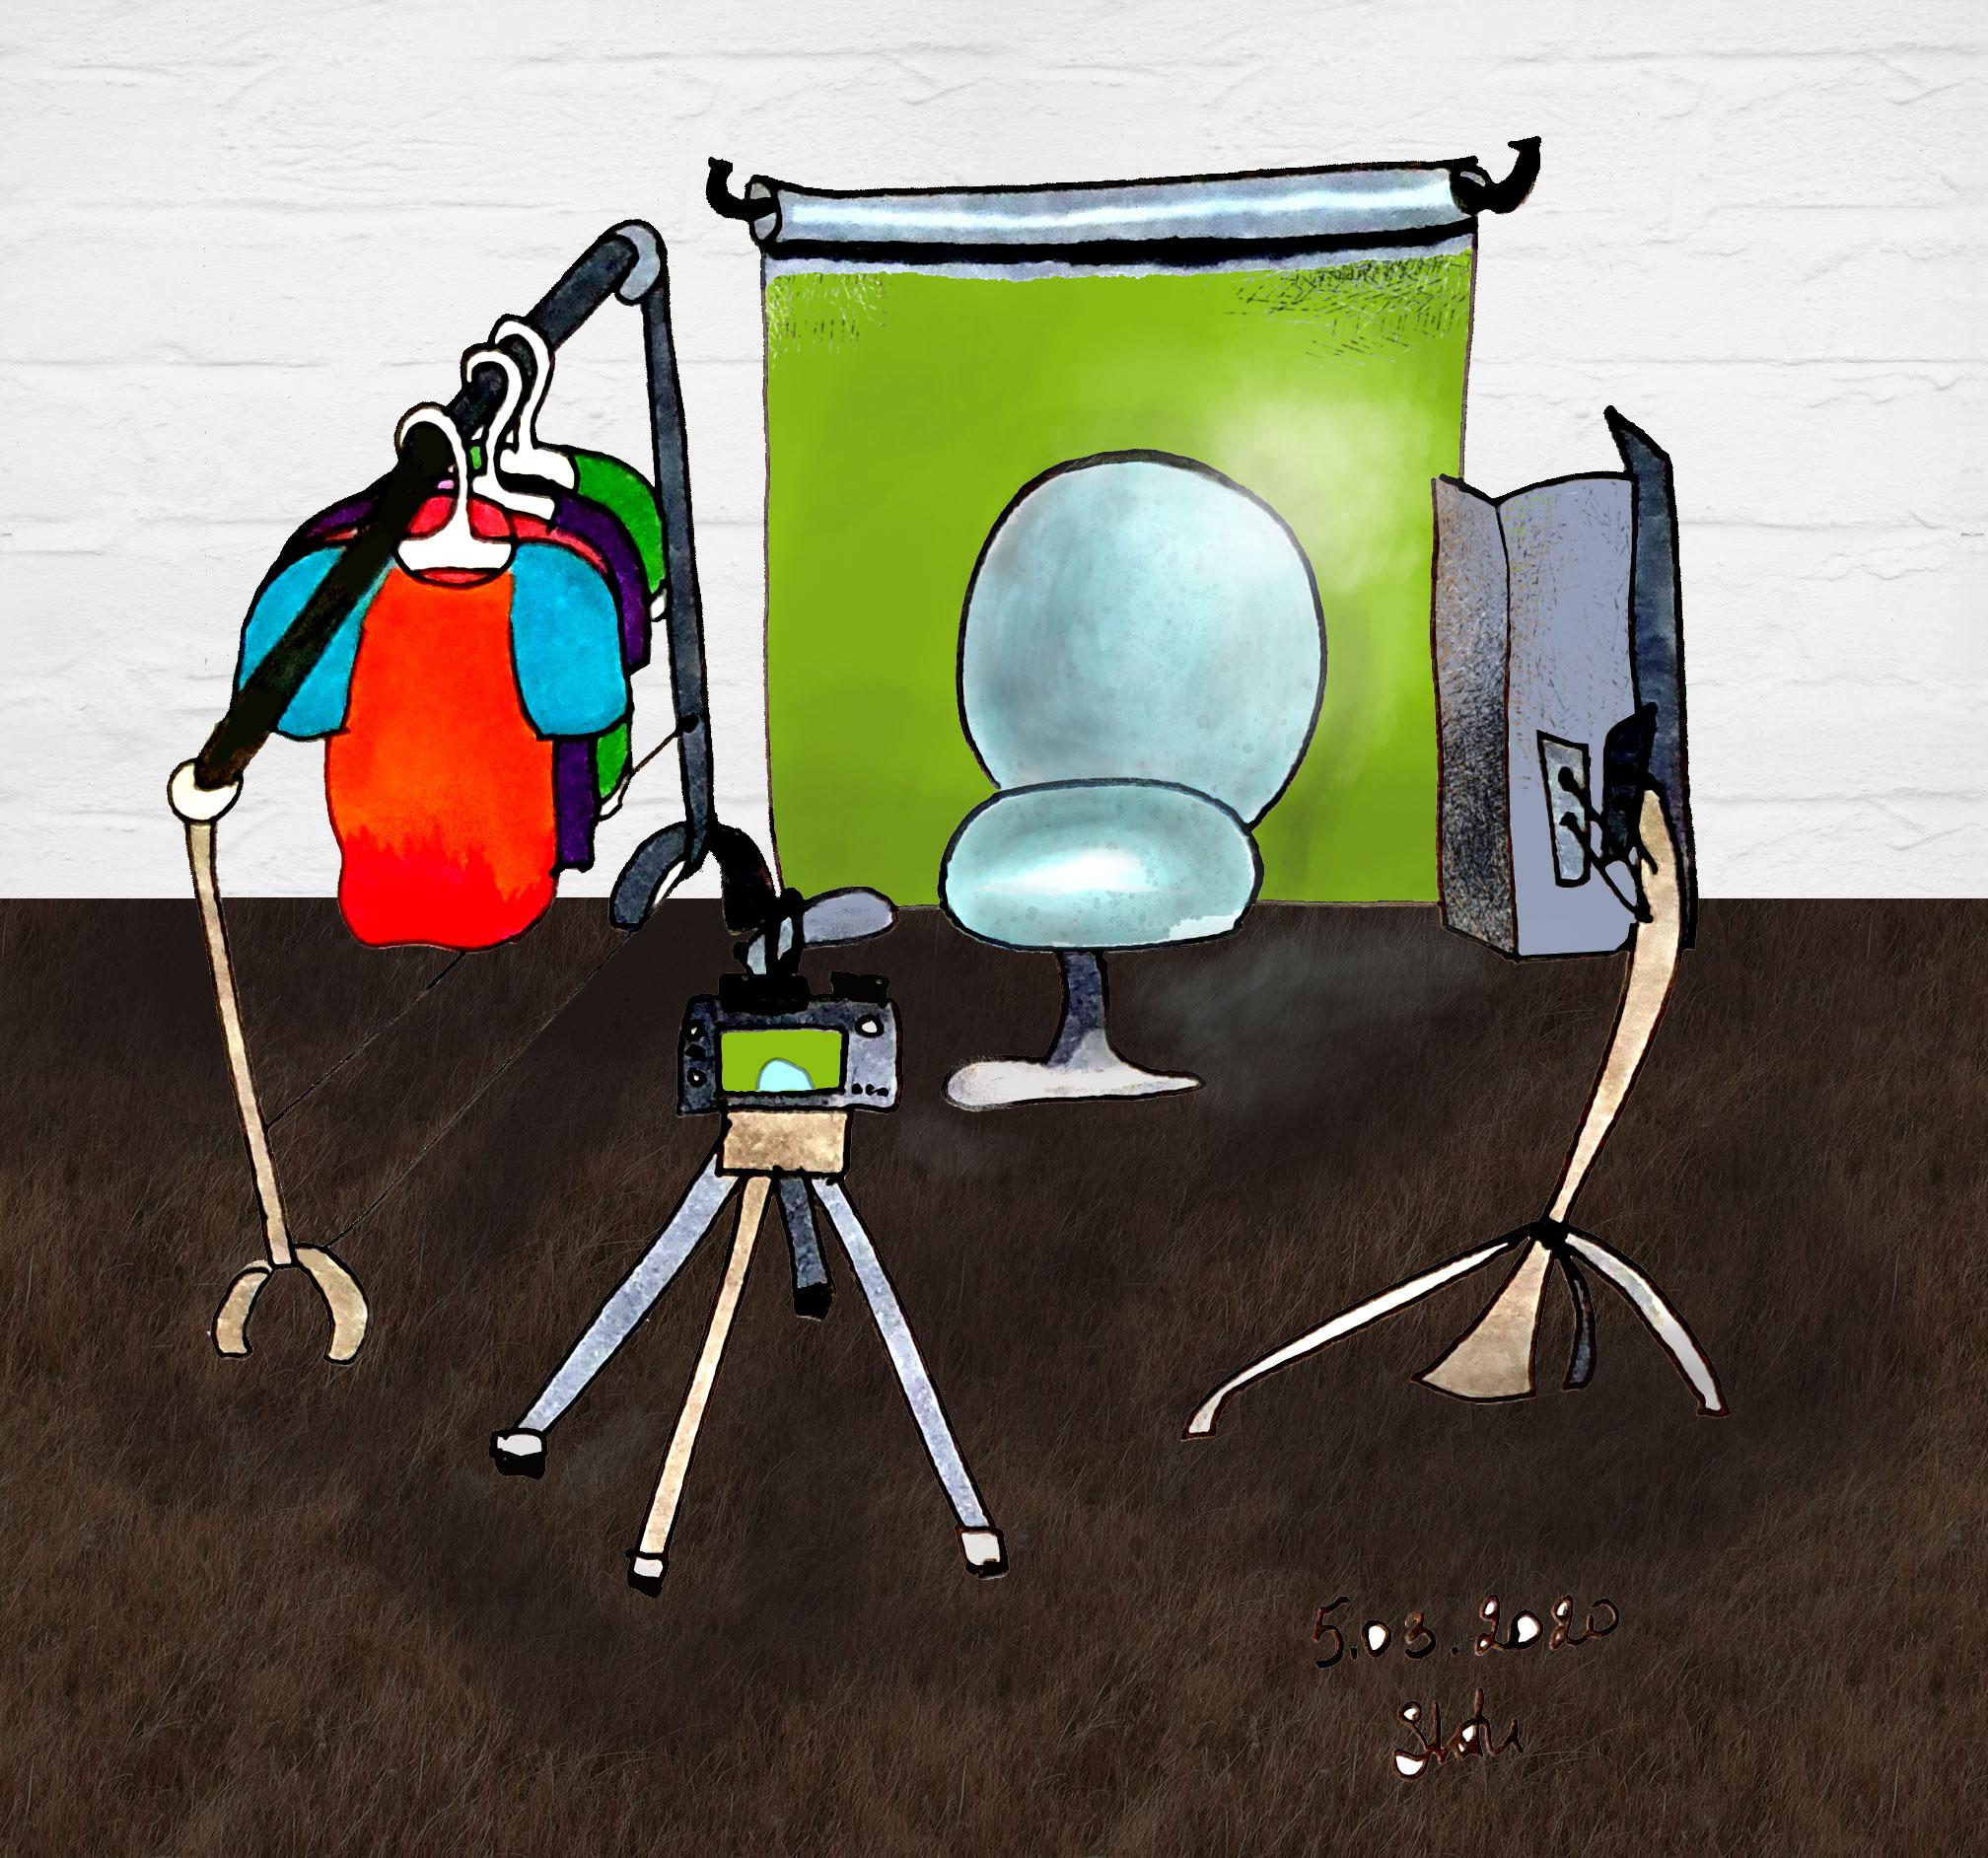 videoproduction-studio